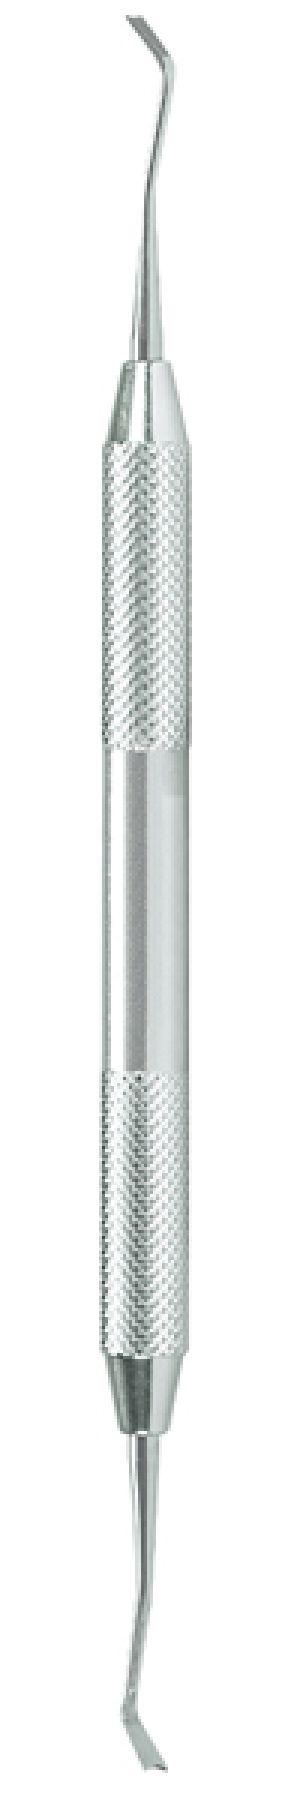 MI-73-106 Dental Wax & Modelling Carver